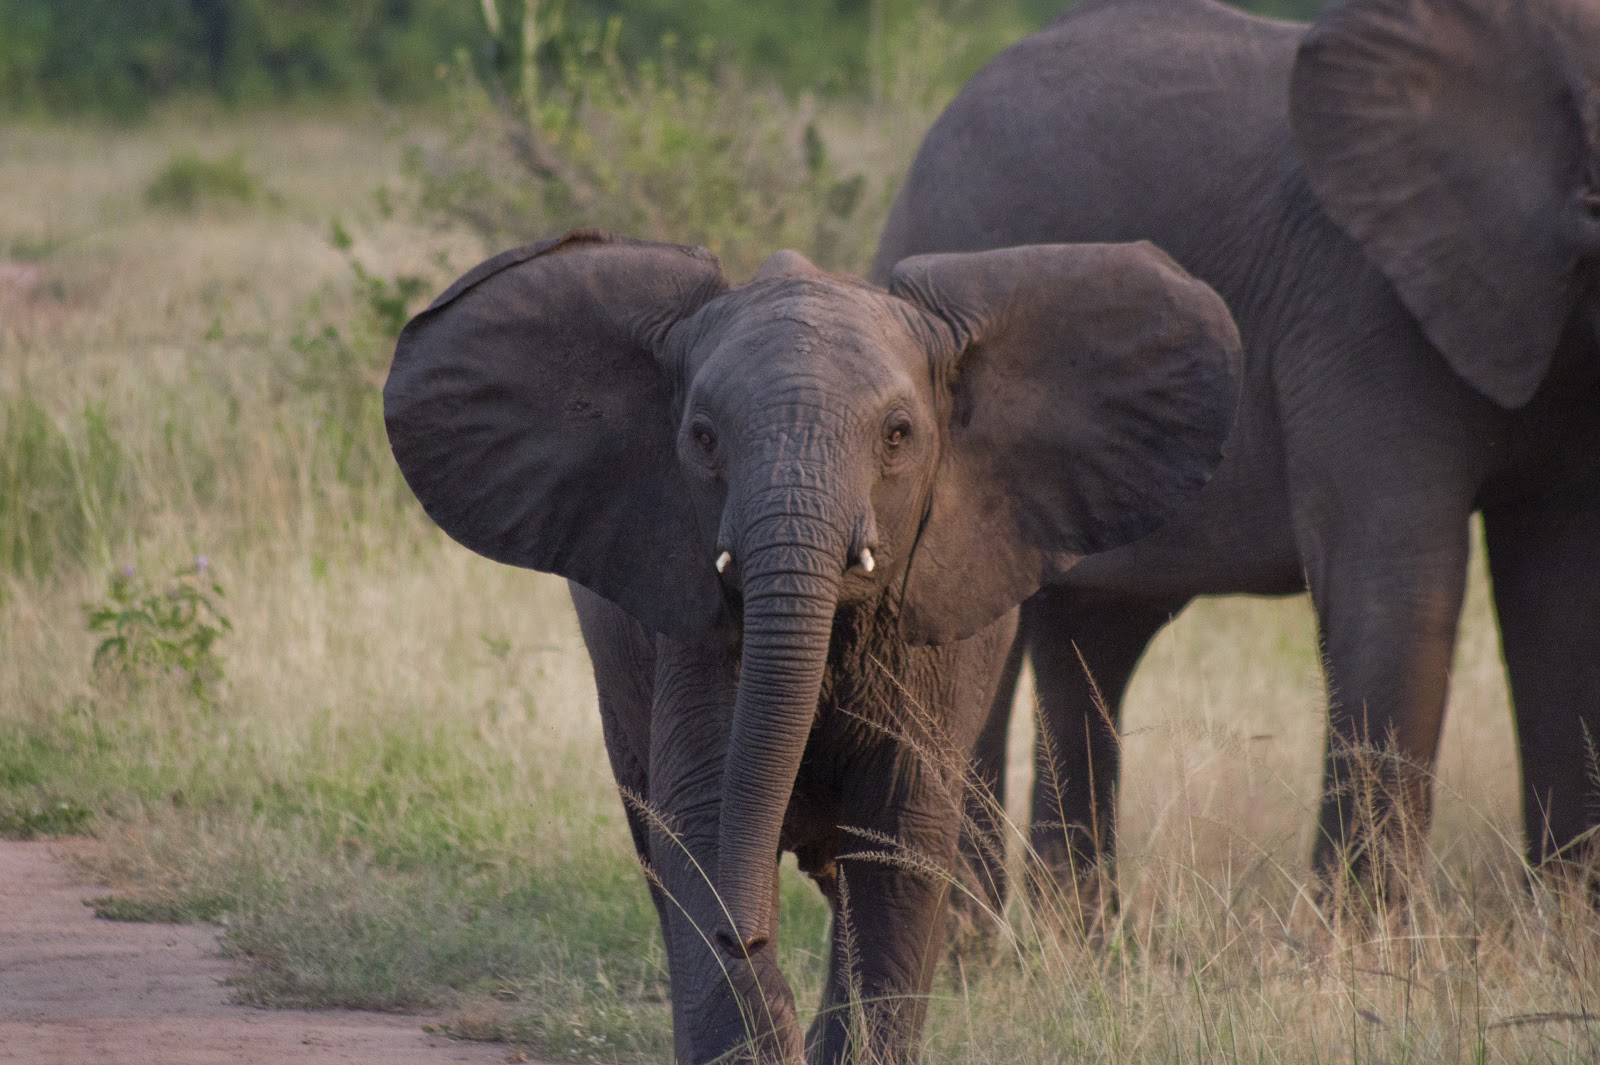 elephant baby african animal animals latest elephants safaris dangerous asian birds wallpapersafari wallpapers